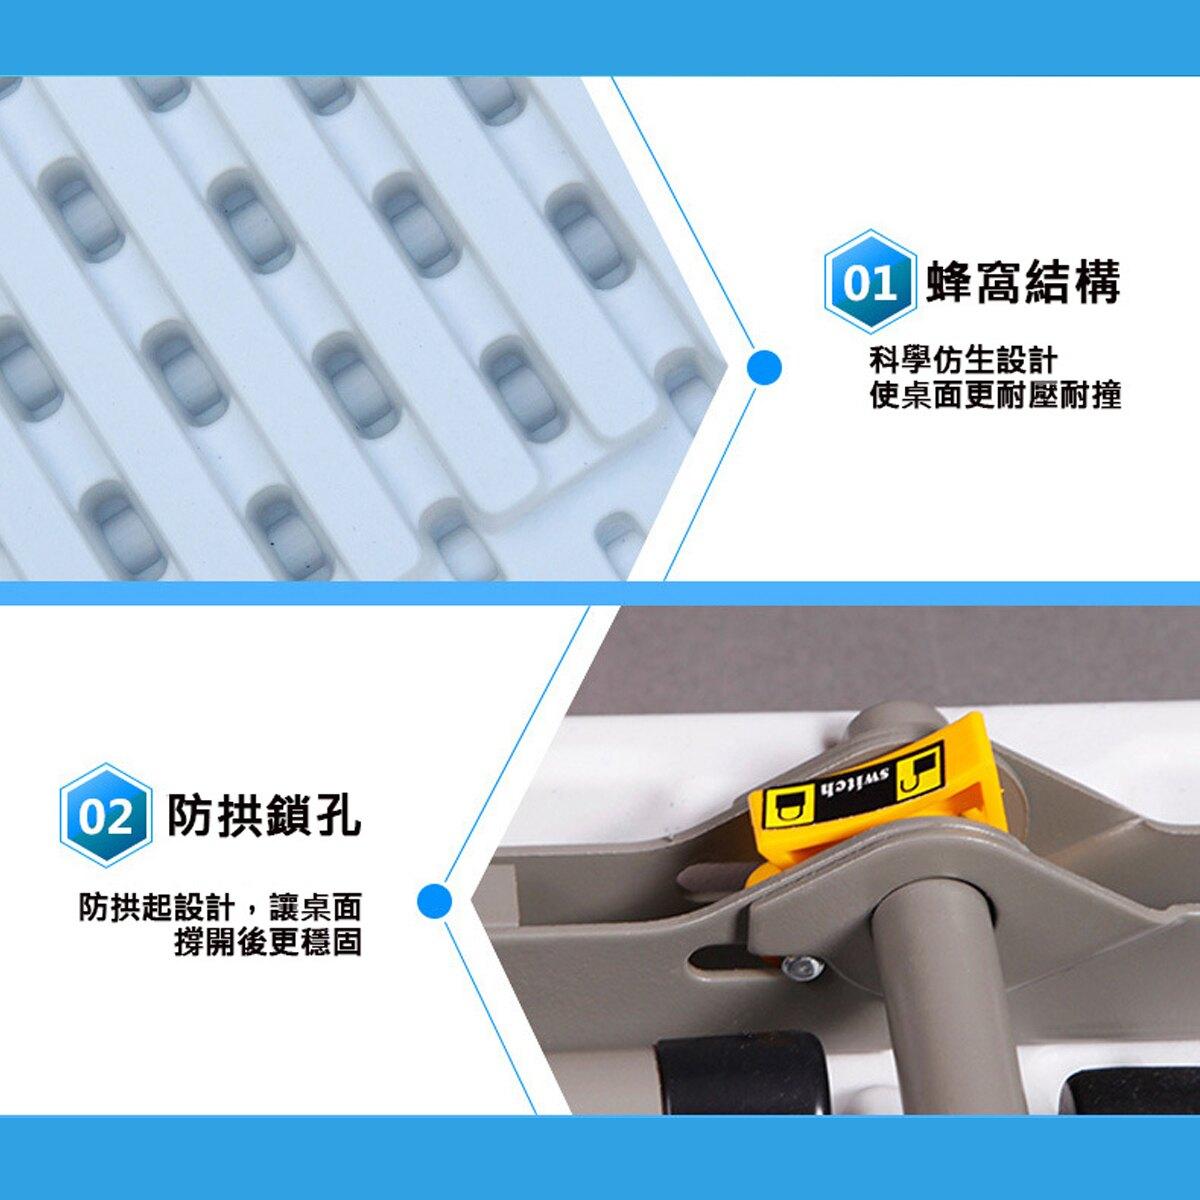 【 CSMART+】戶外多功能輕巧便攜好收納折疊桌 蜂窩結構更耐壓耐撞 (1.2米_4~6人)